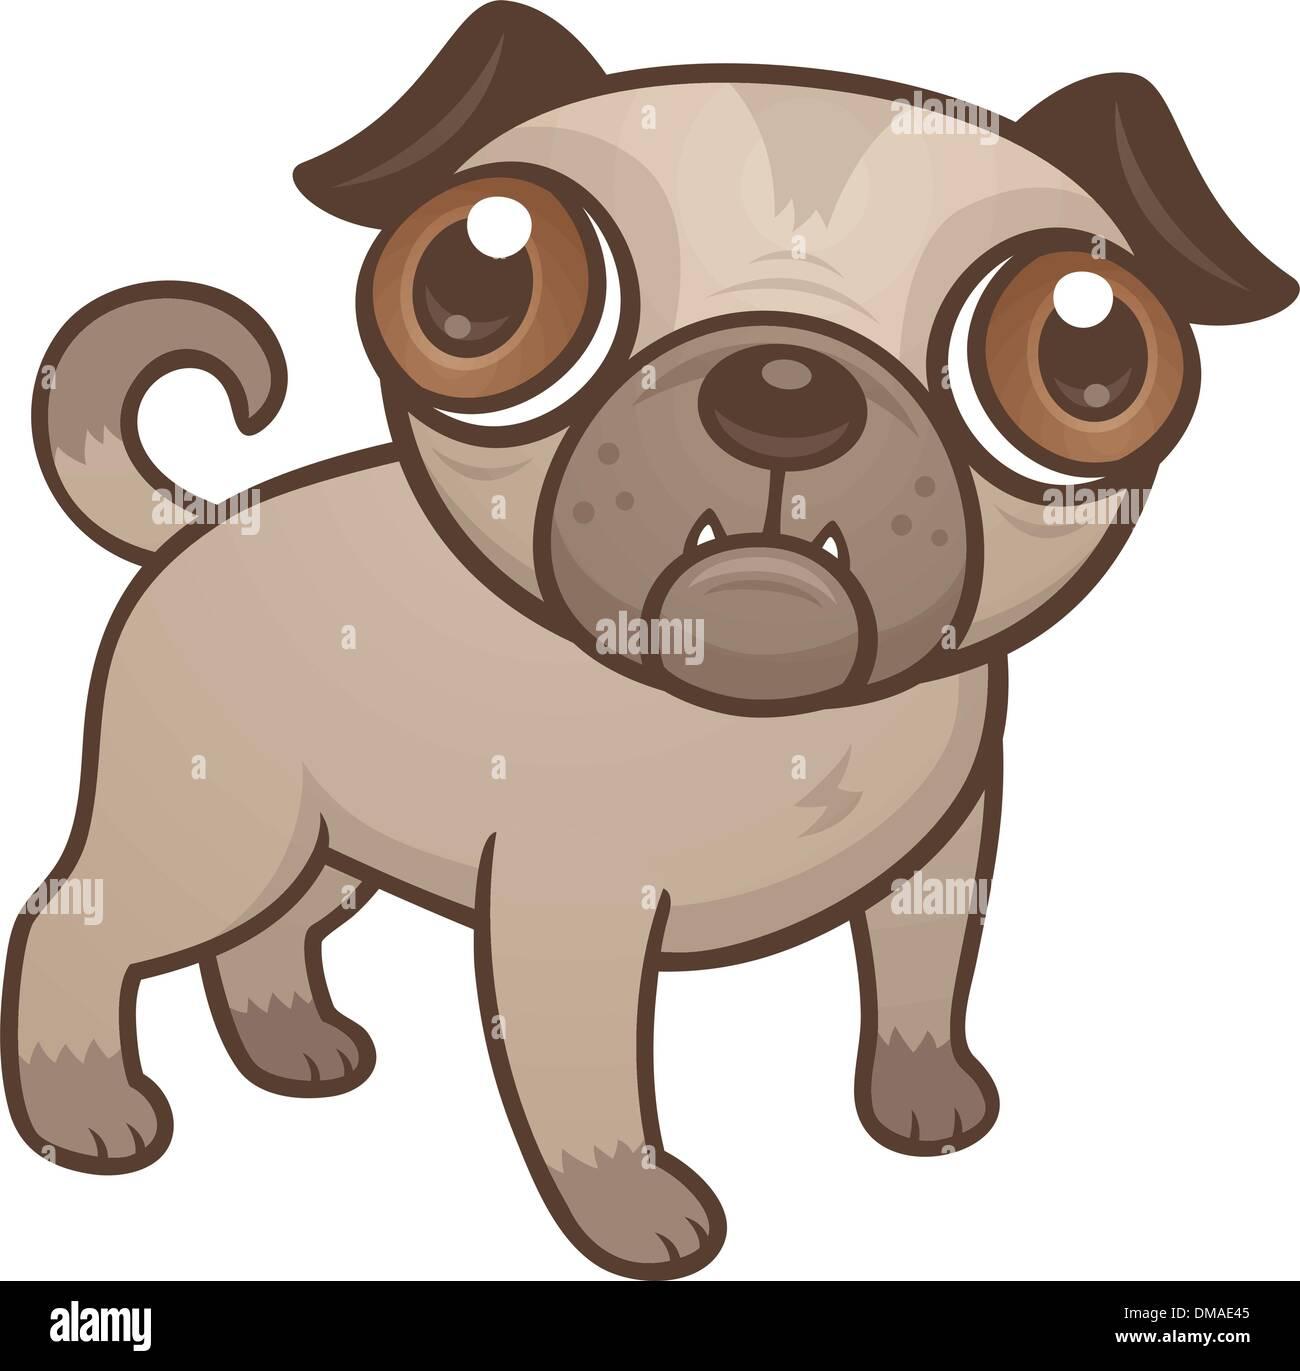 Pug Puppy Cartoon Stock Vector